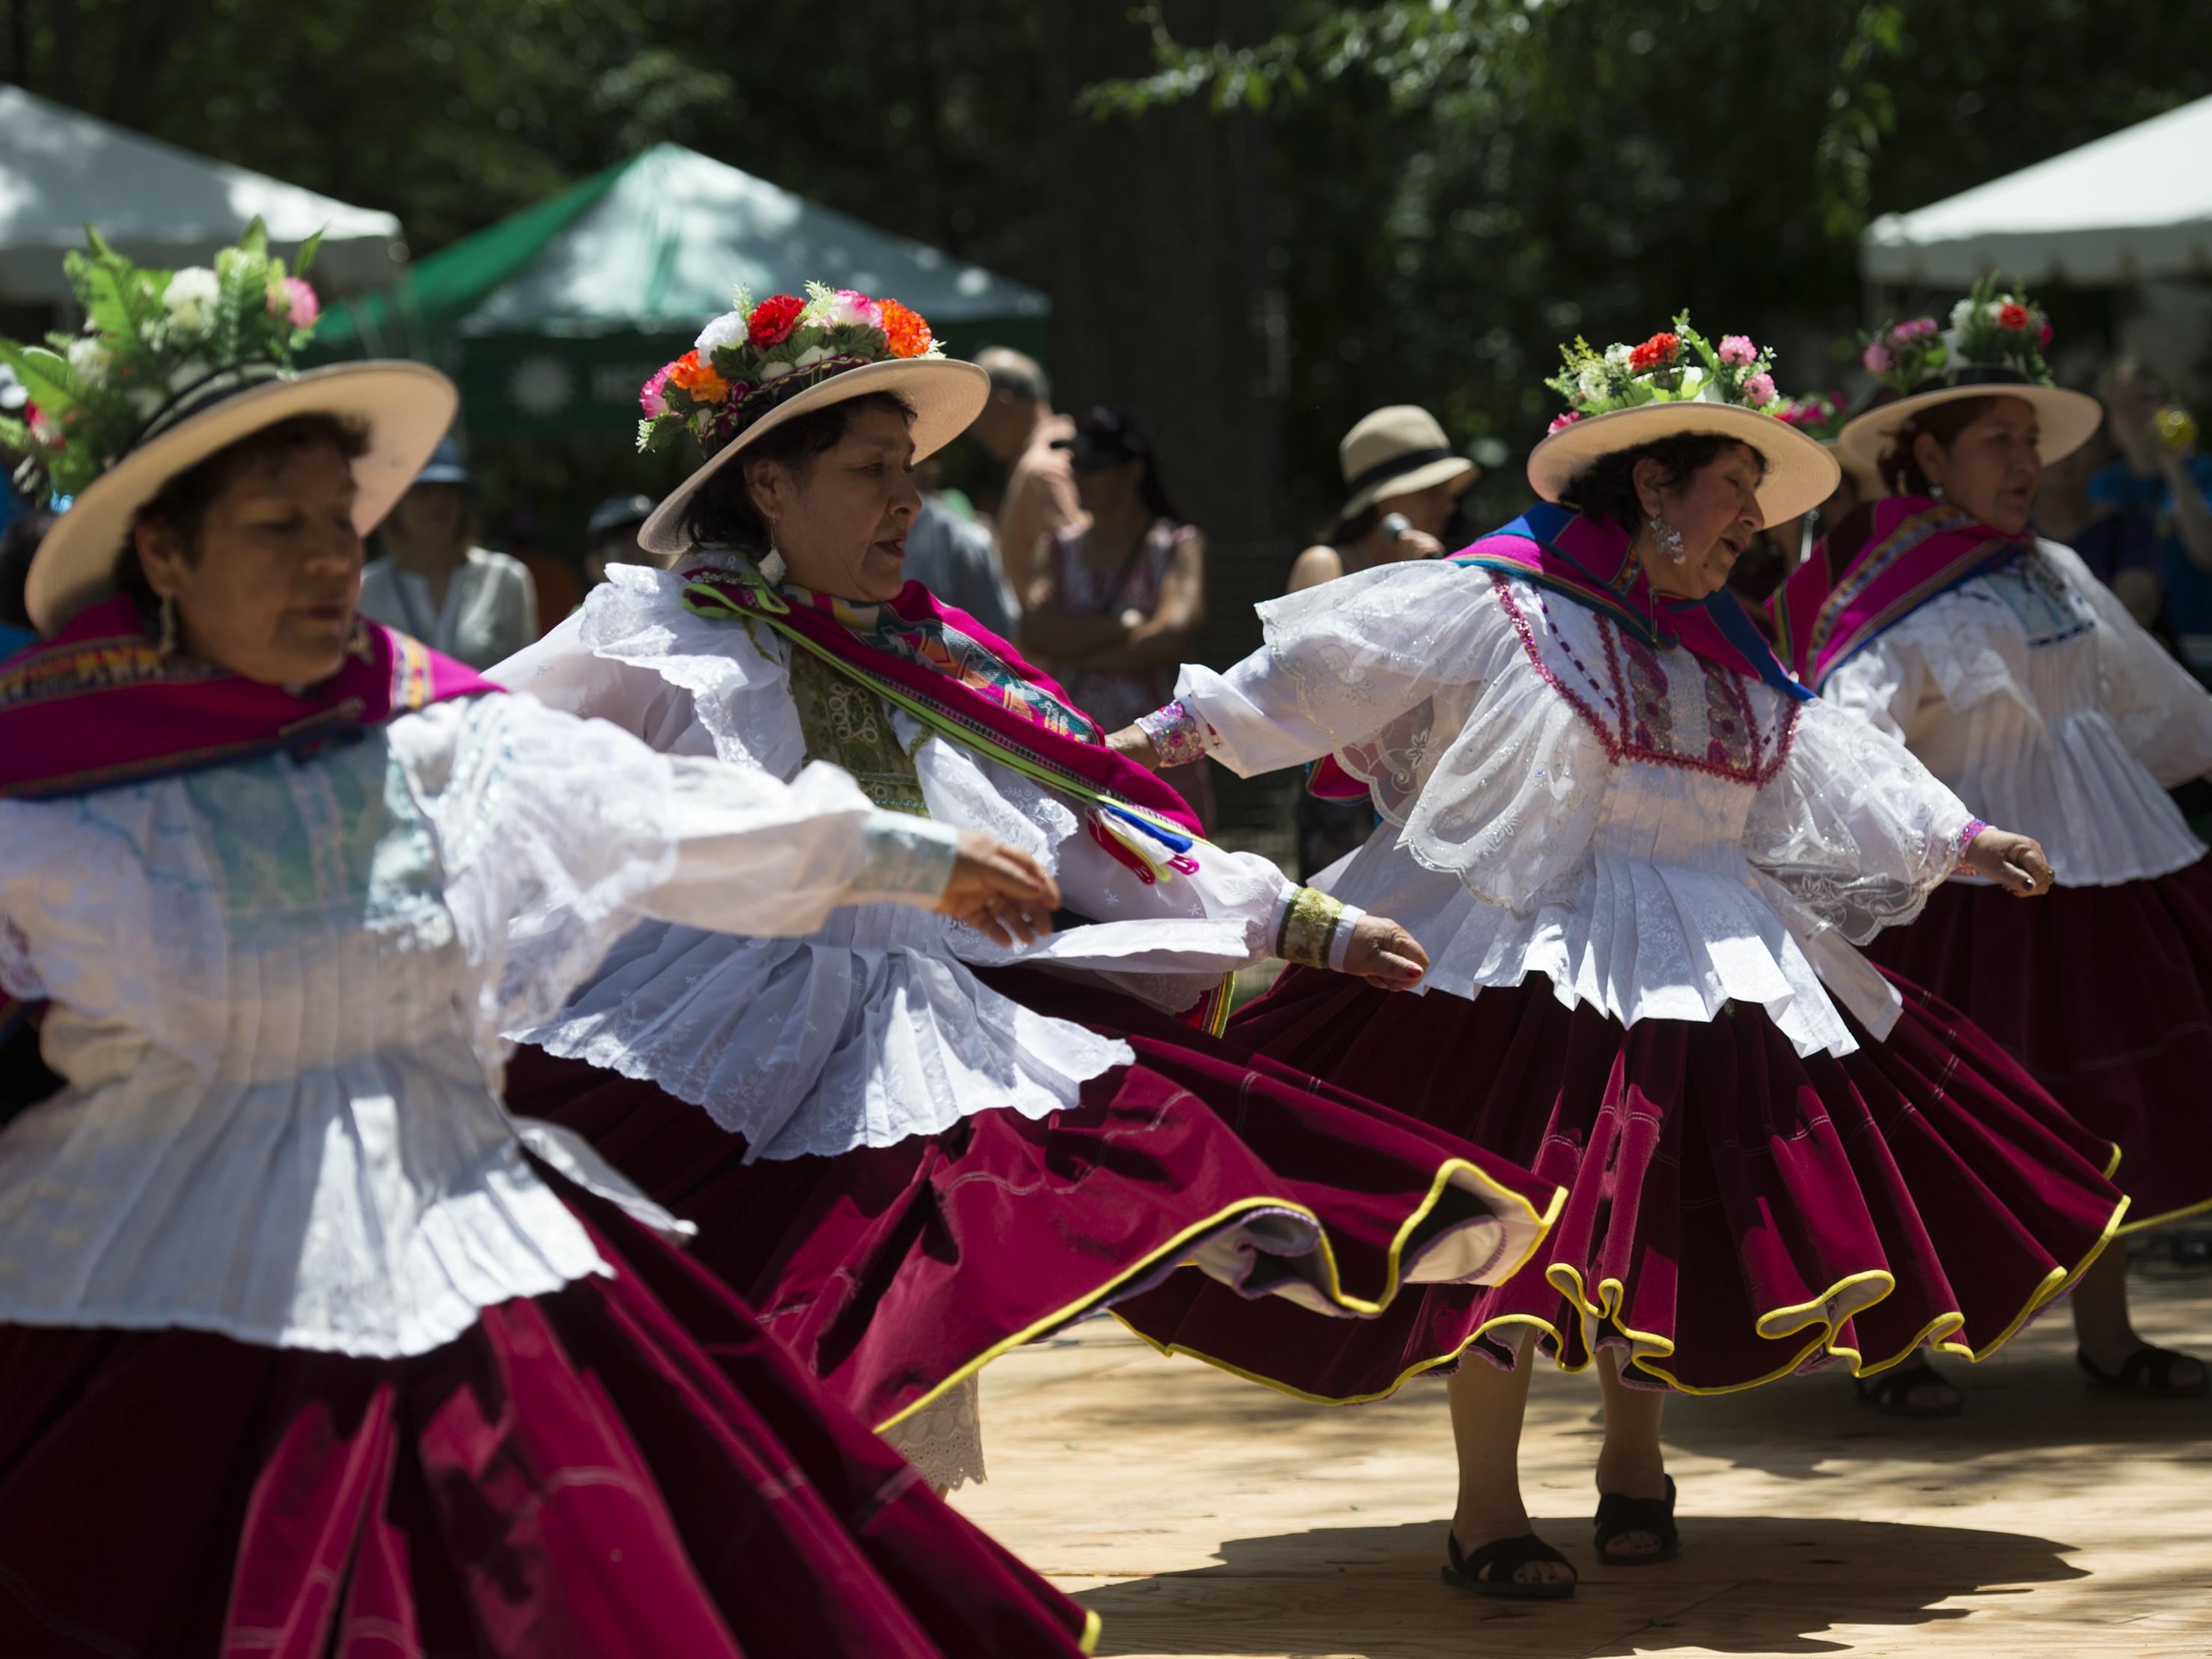 Smithsonian Shortens Folklife Festival On National Mall To Just 2 Days